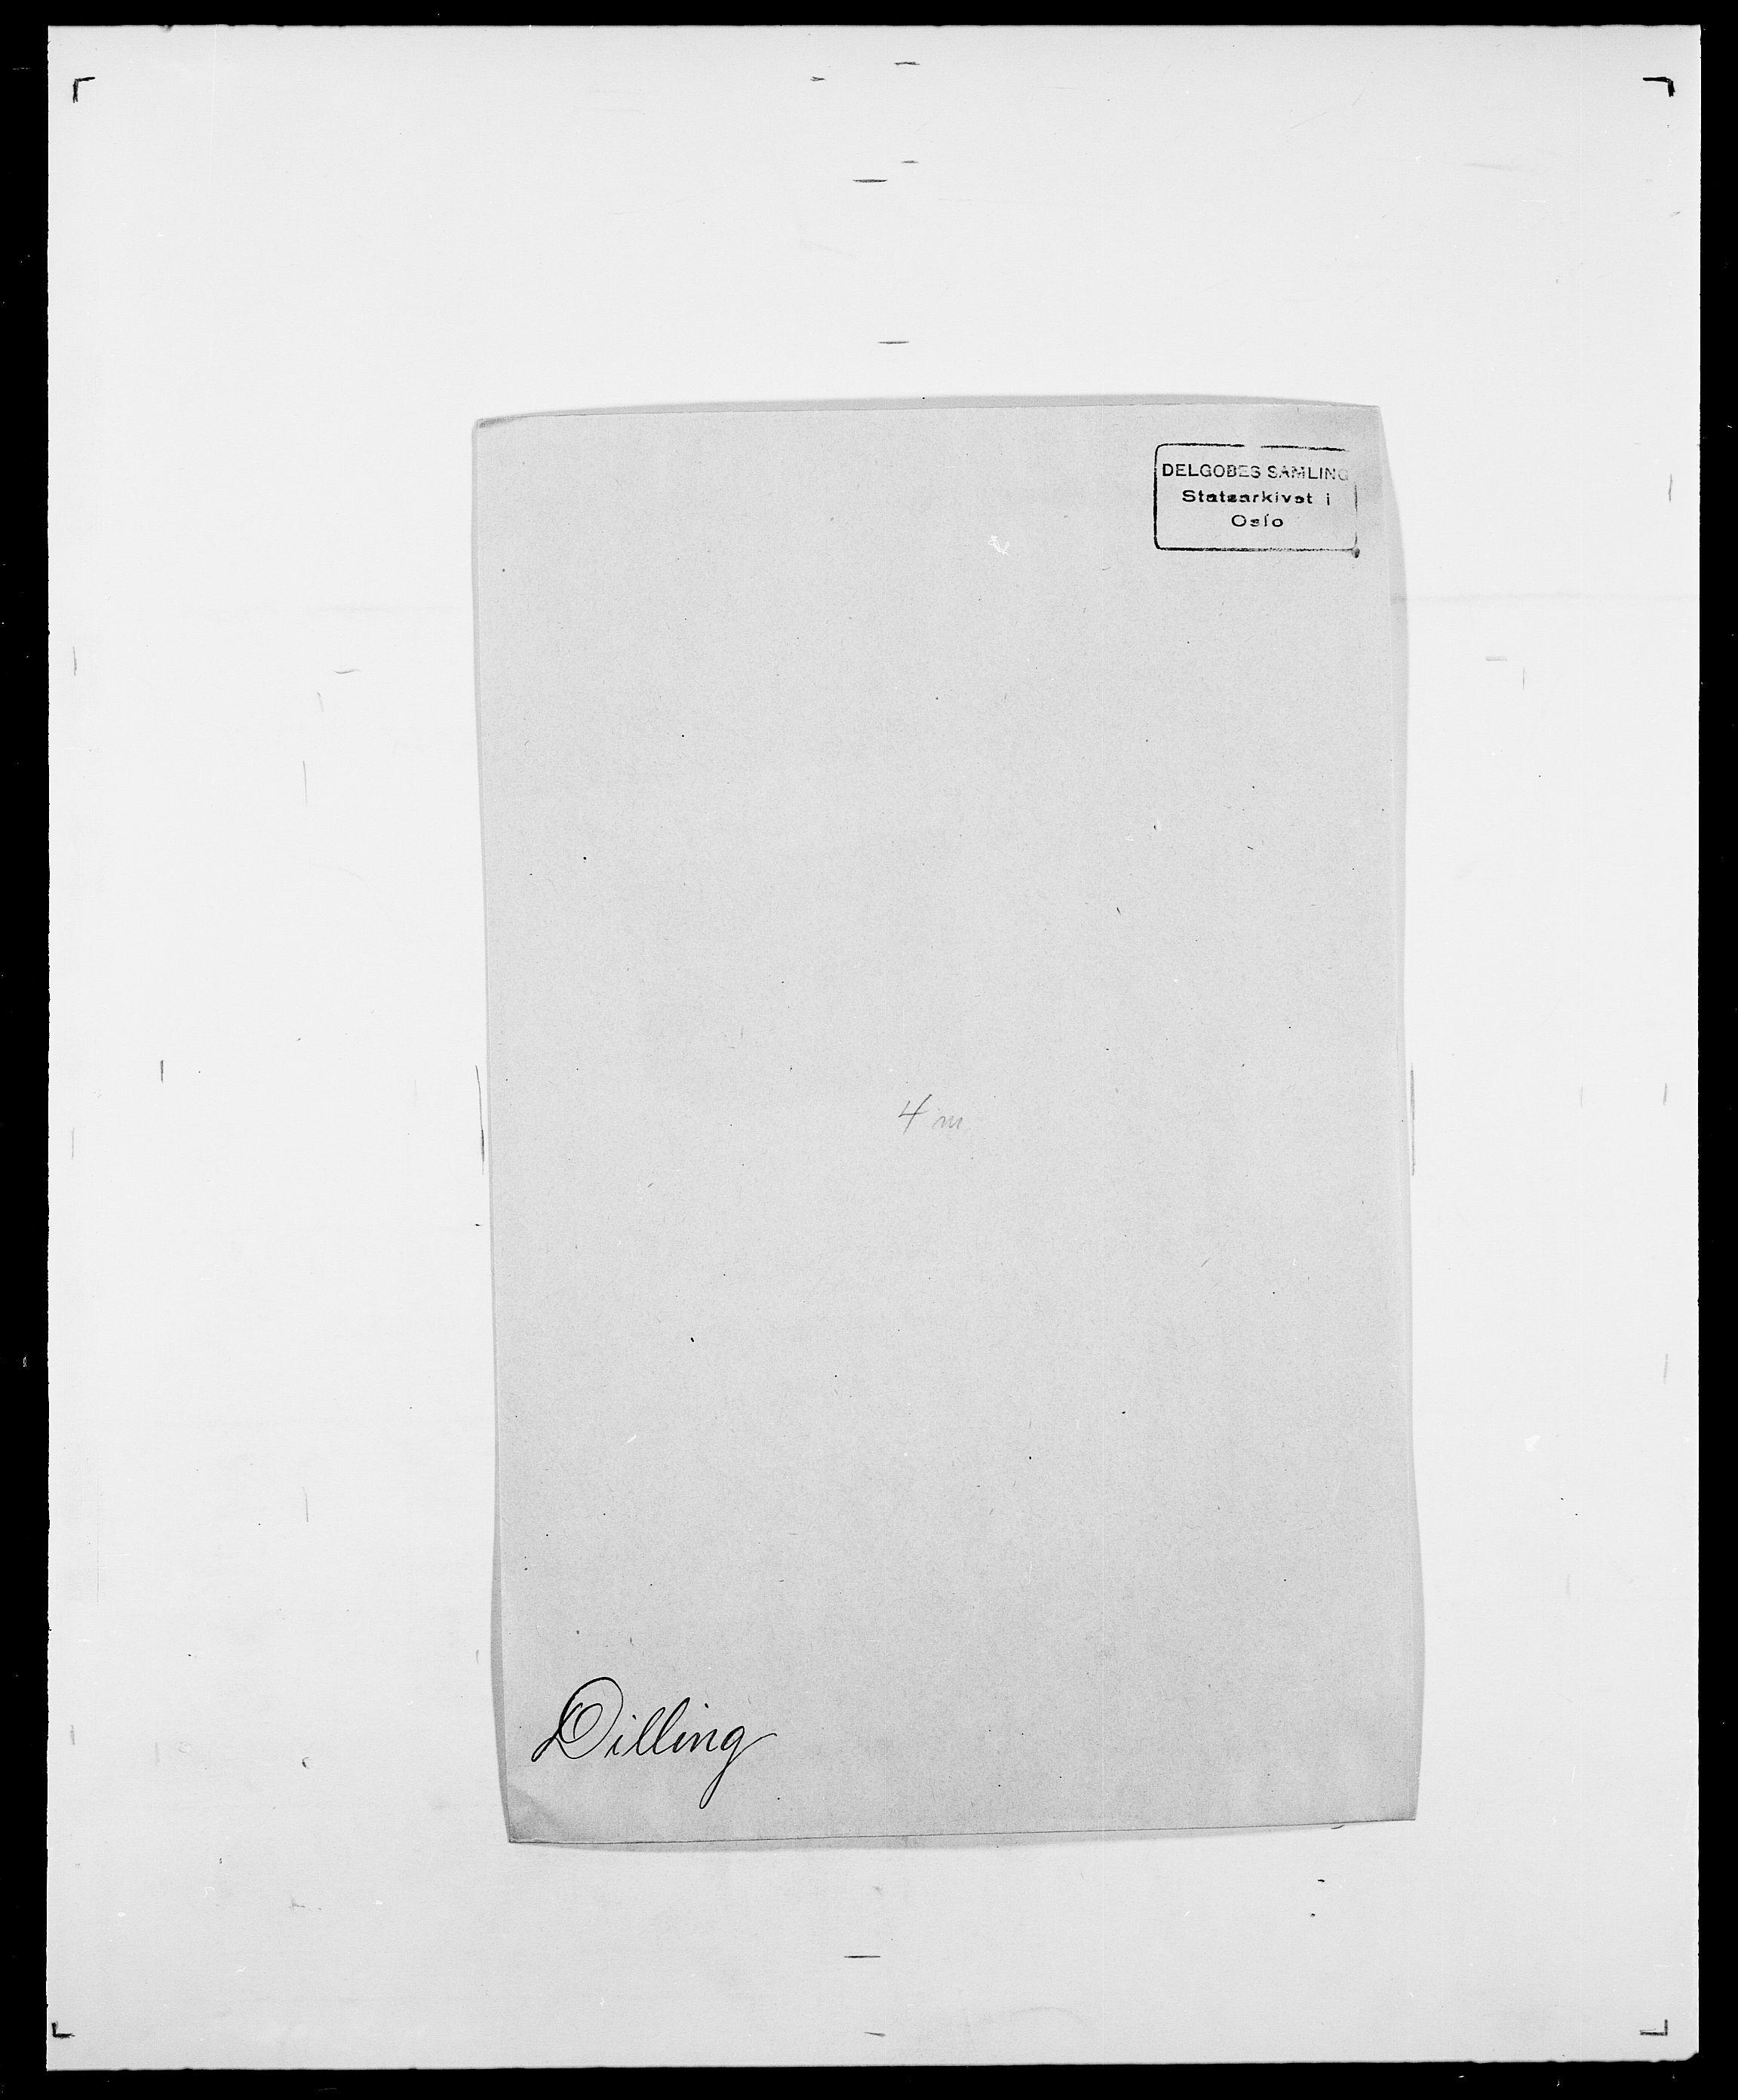 SAO, Delgobe, Charles Antoine - samling, D/Da/L0009: Dahl - v. Düren, s. 573